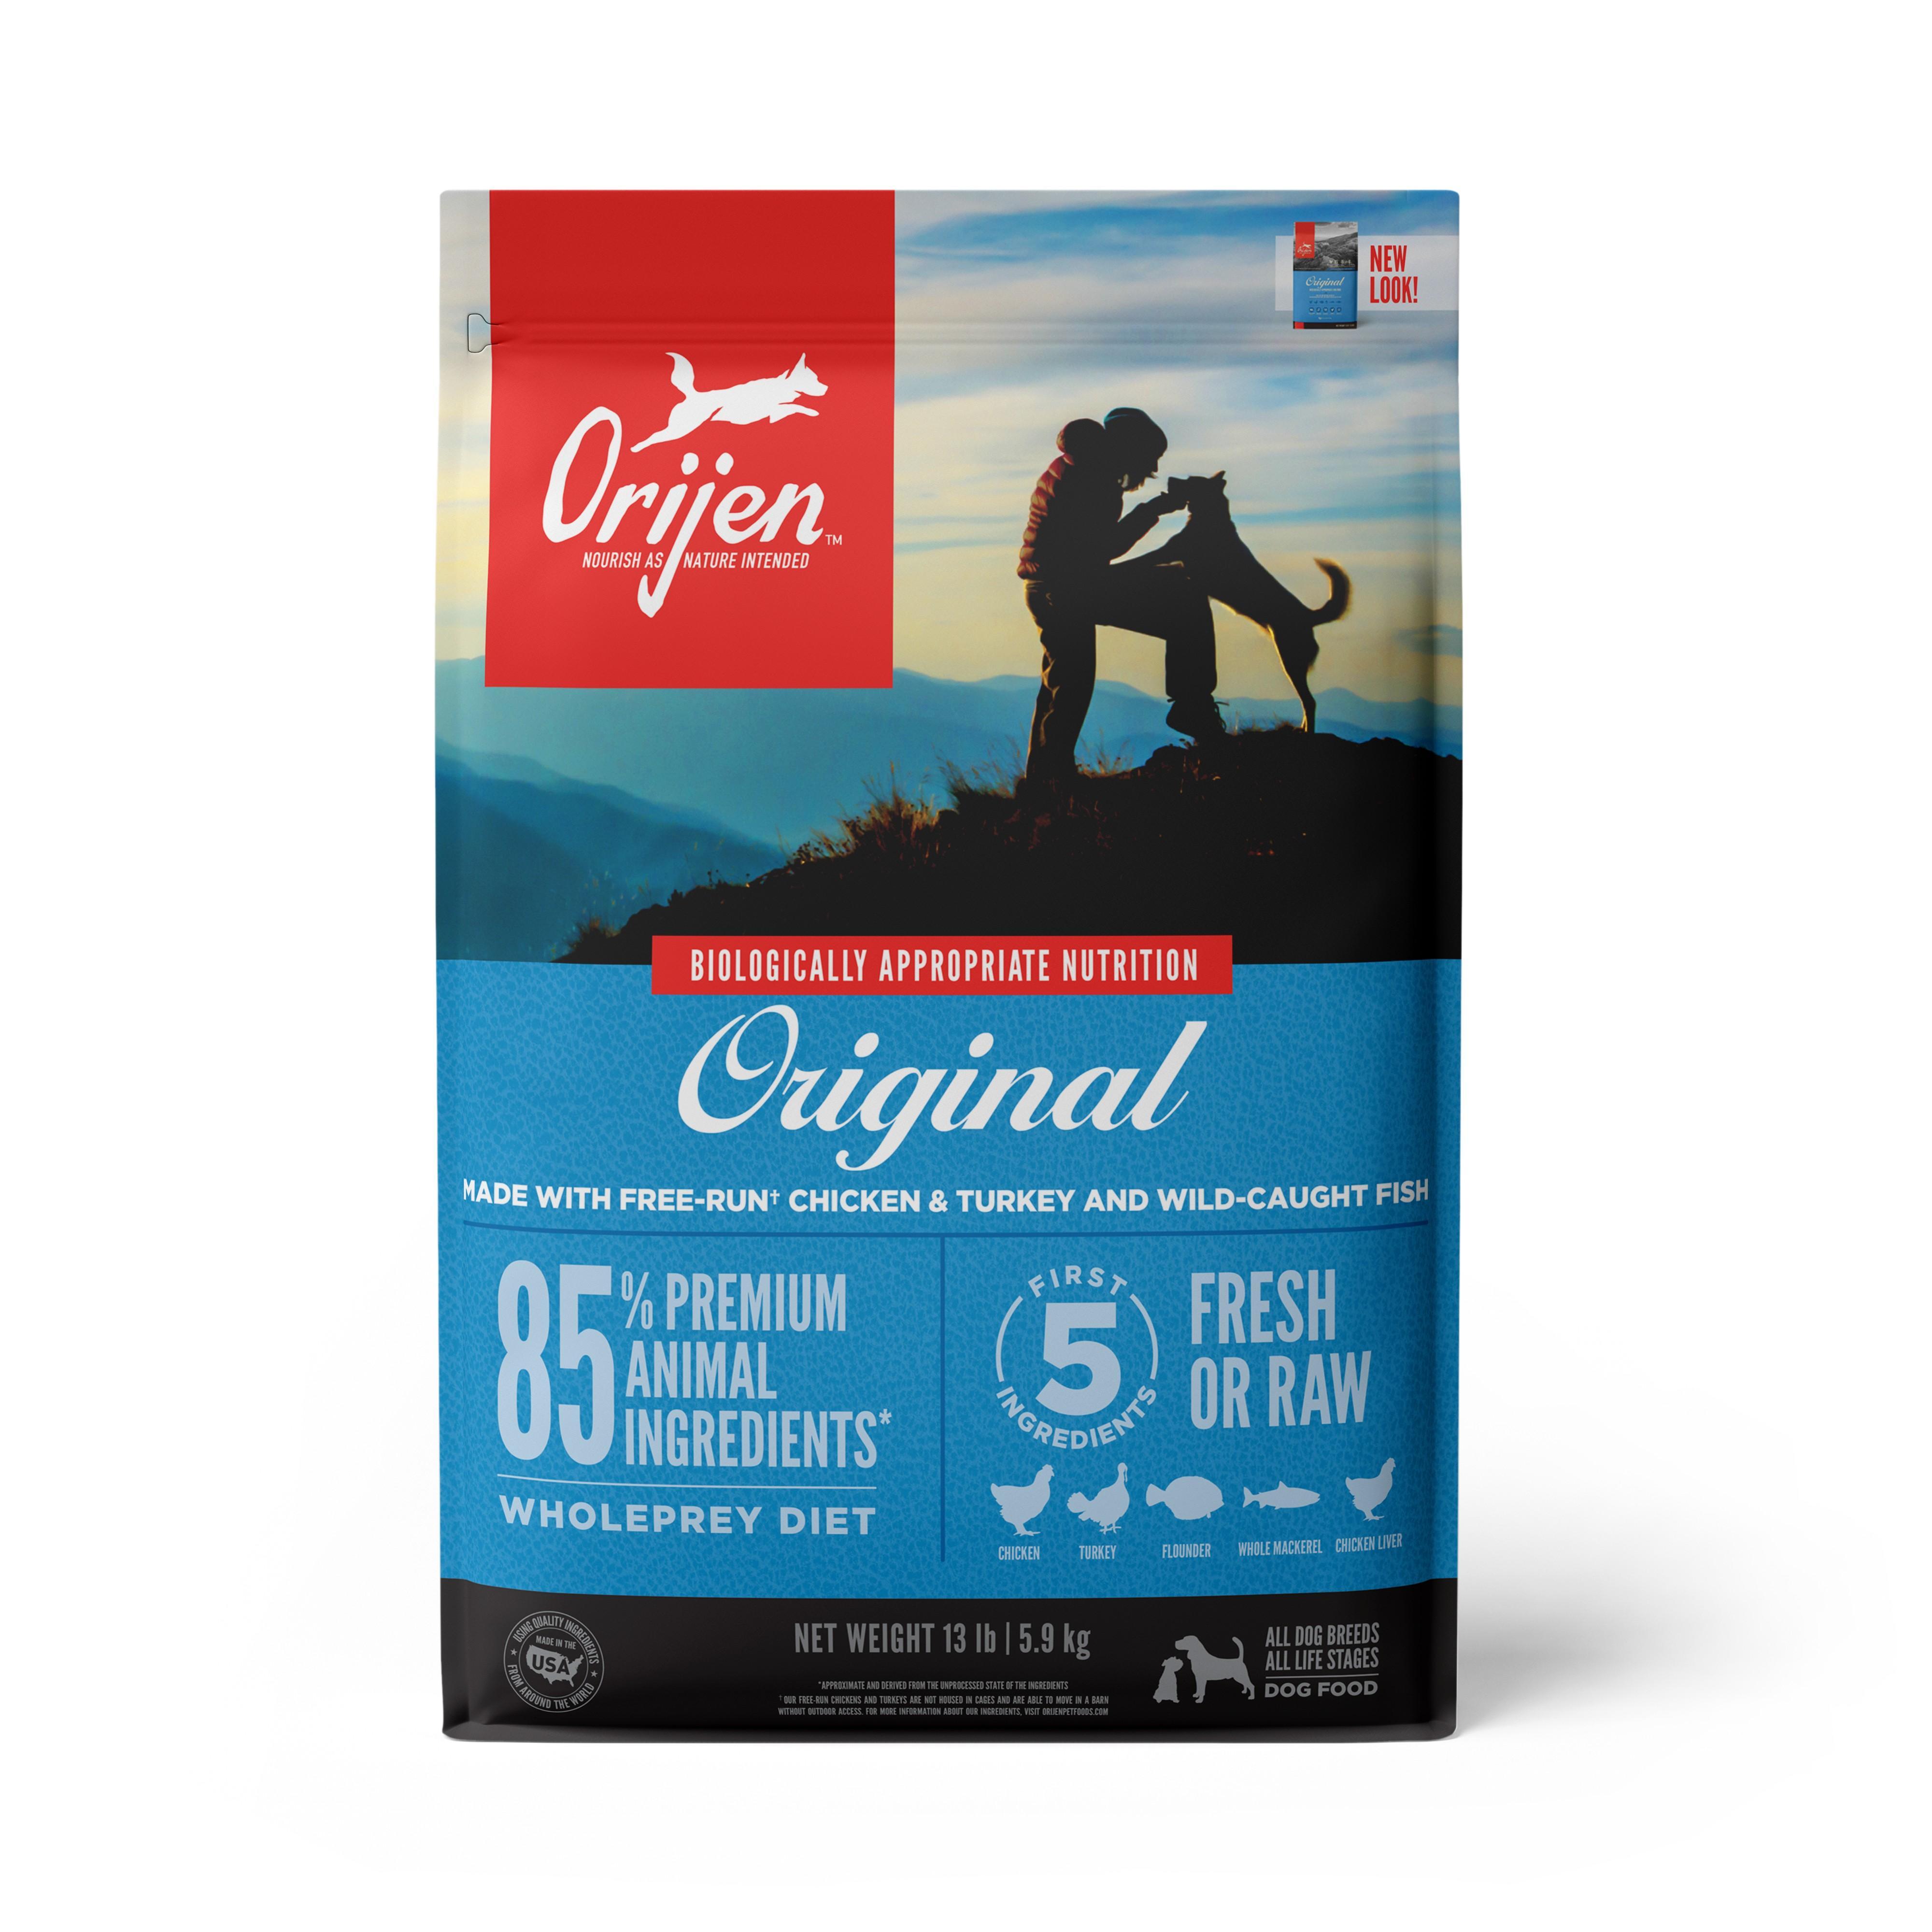 ORIJEN Original Grain-Free Dry Dog Food, 13-lb